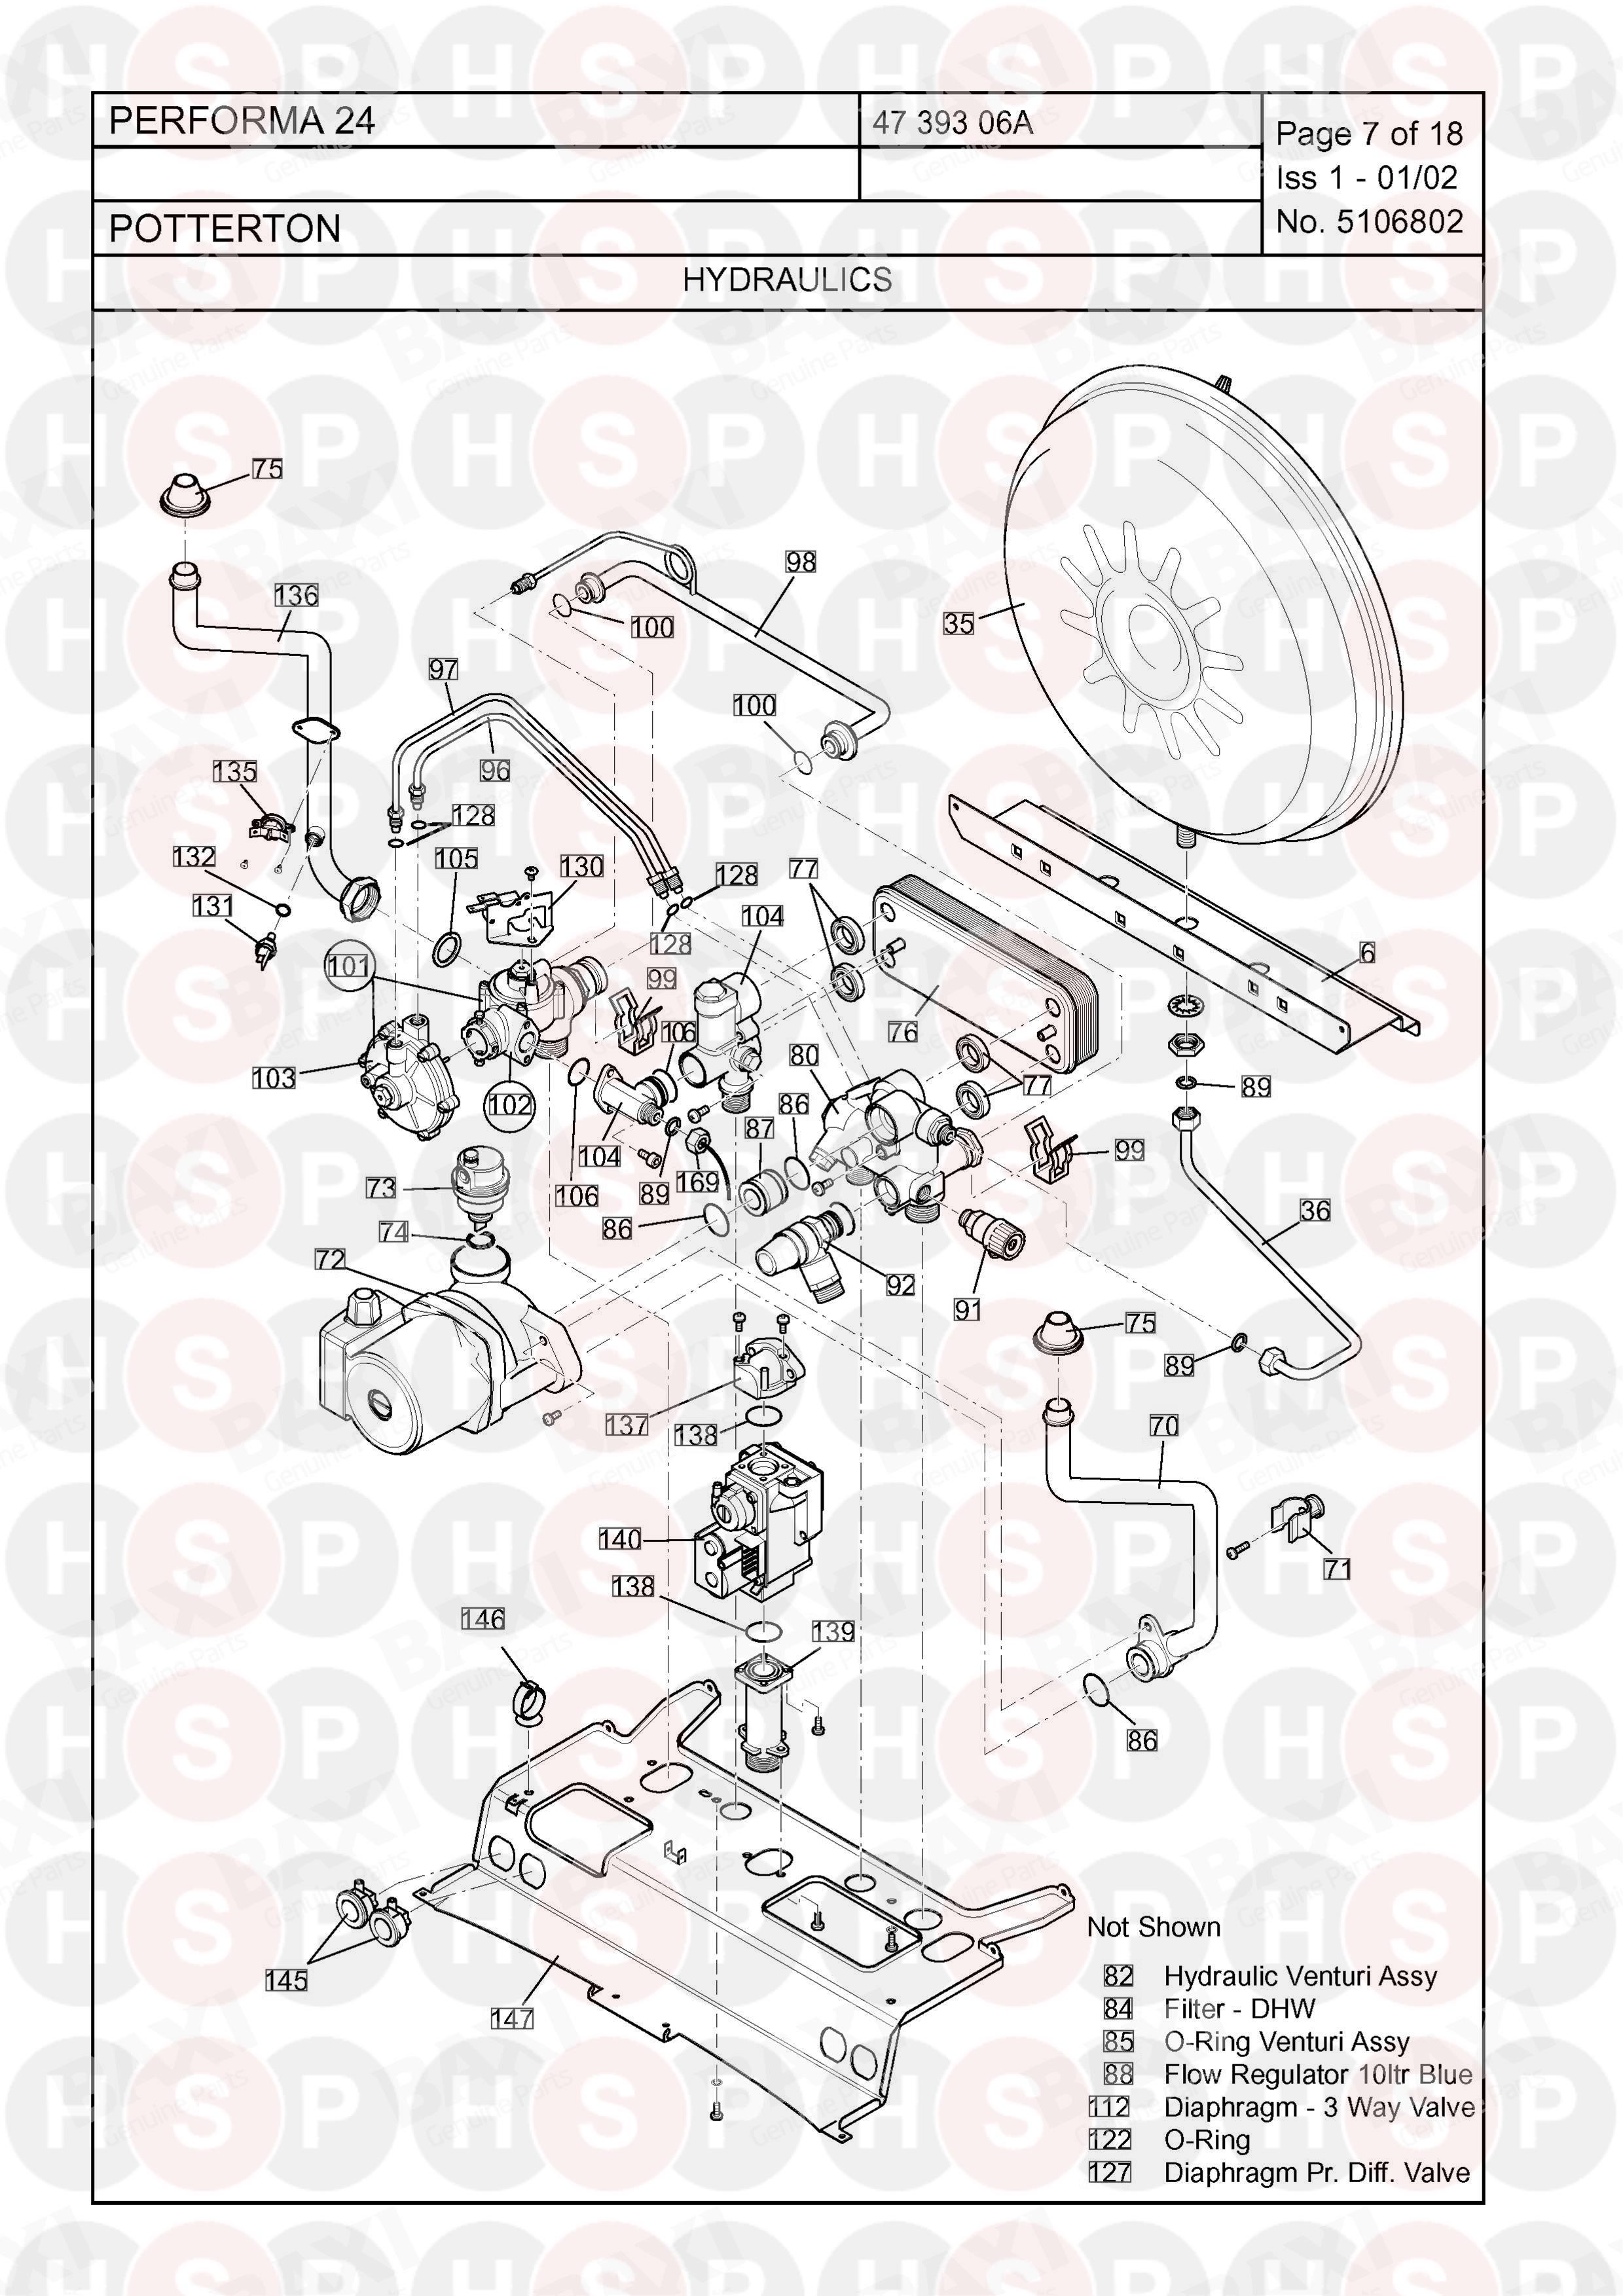 Potterton Performa 24 >> Potterton Performa 24 Hydraulics Diagram Heating Spare Parts